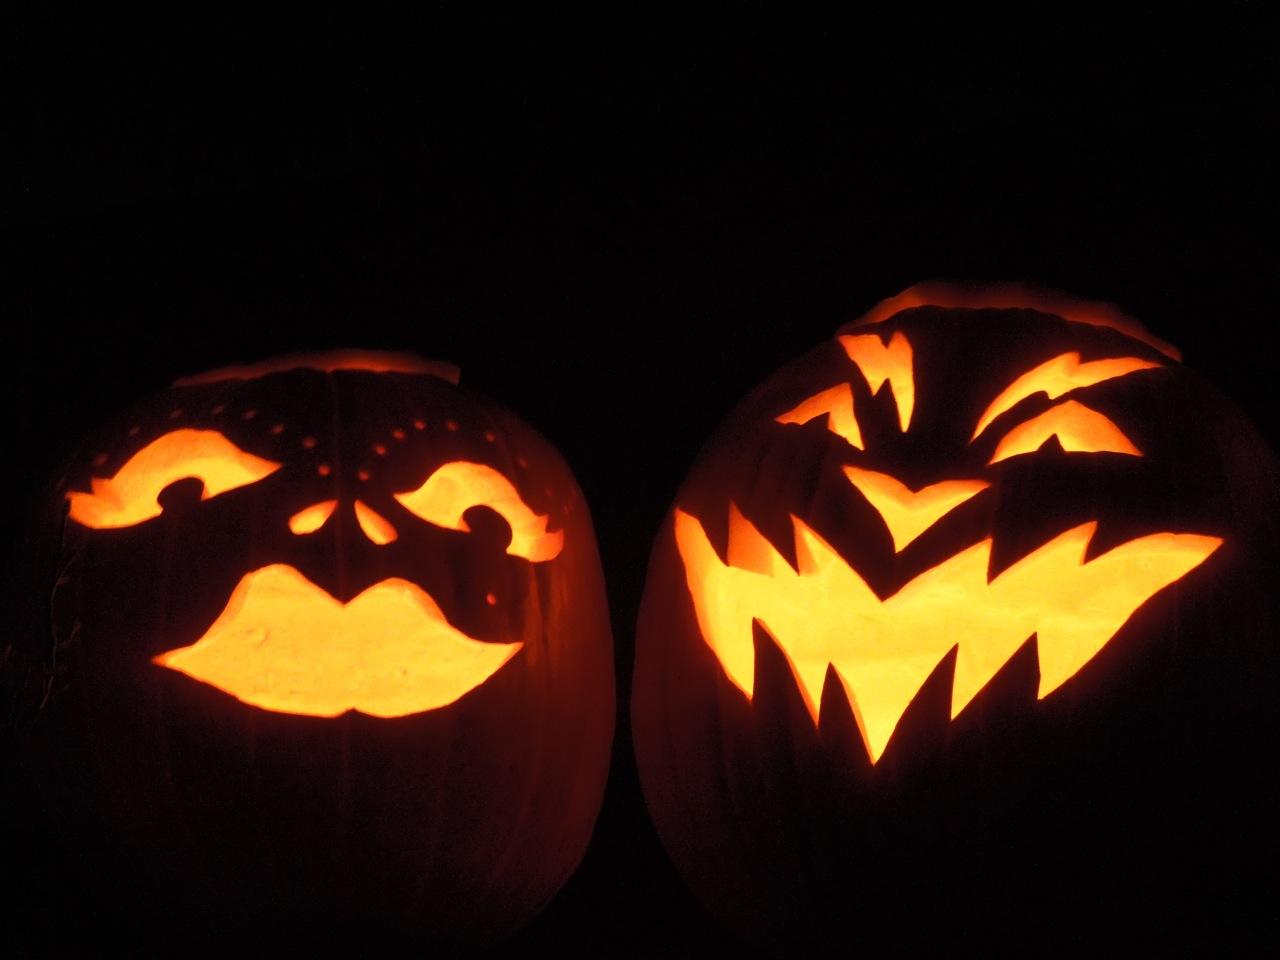 Carved Halloween Pumpkin Designs